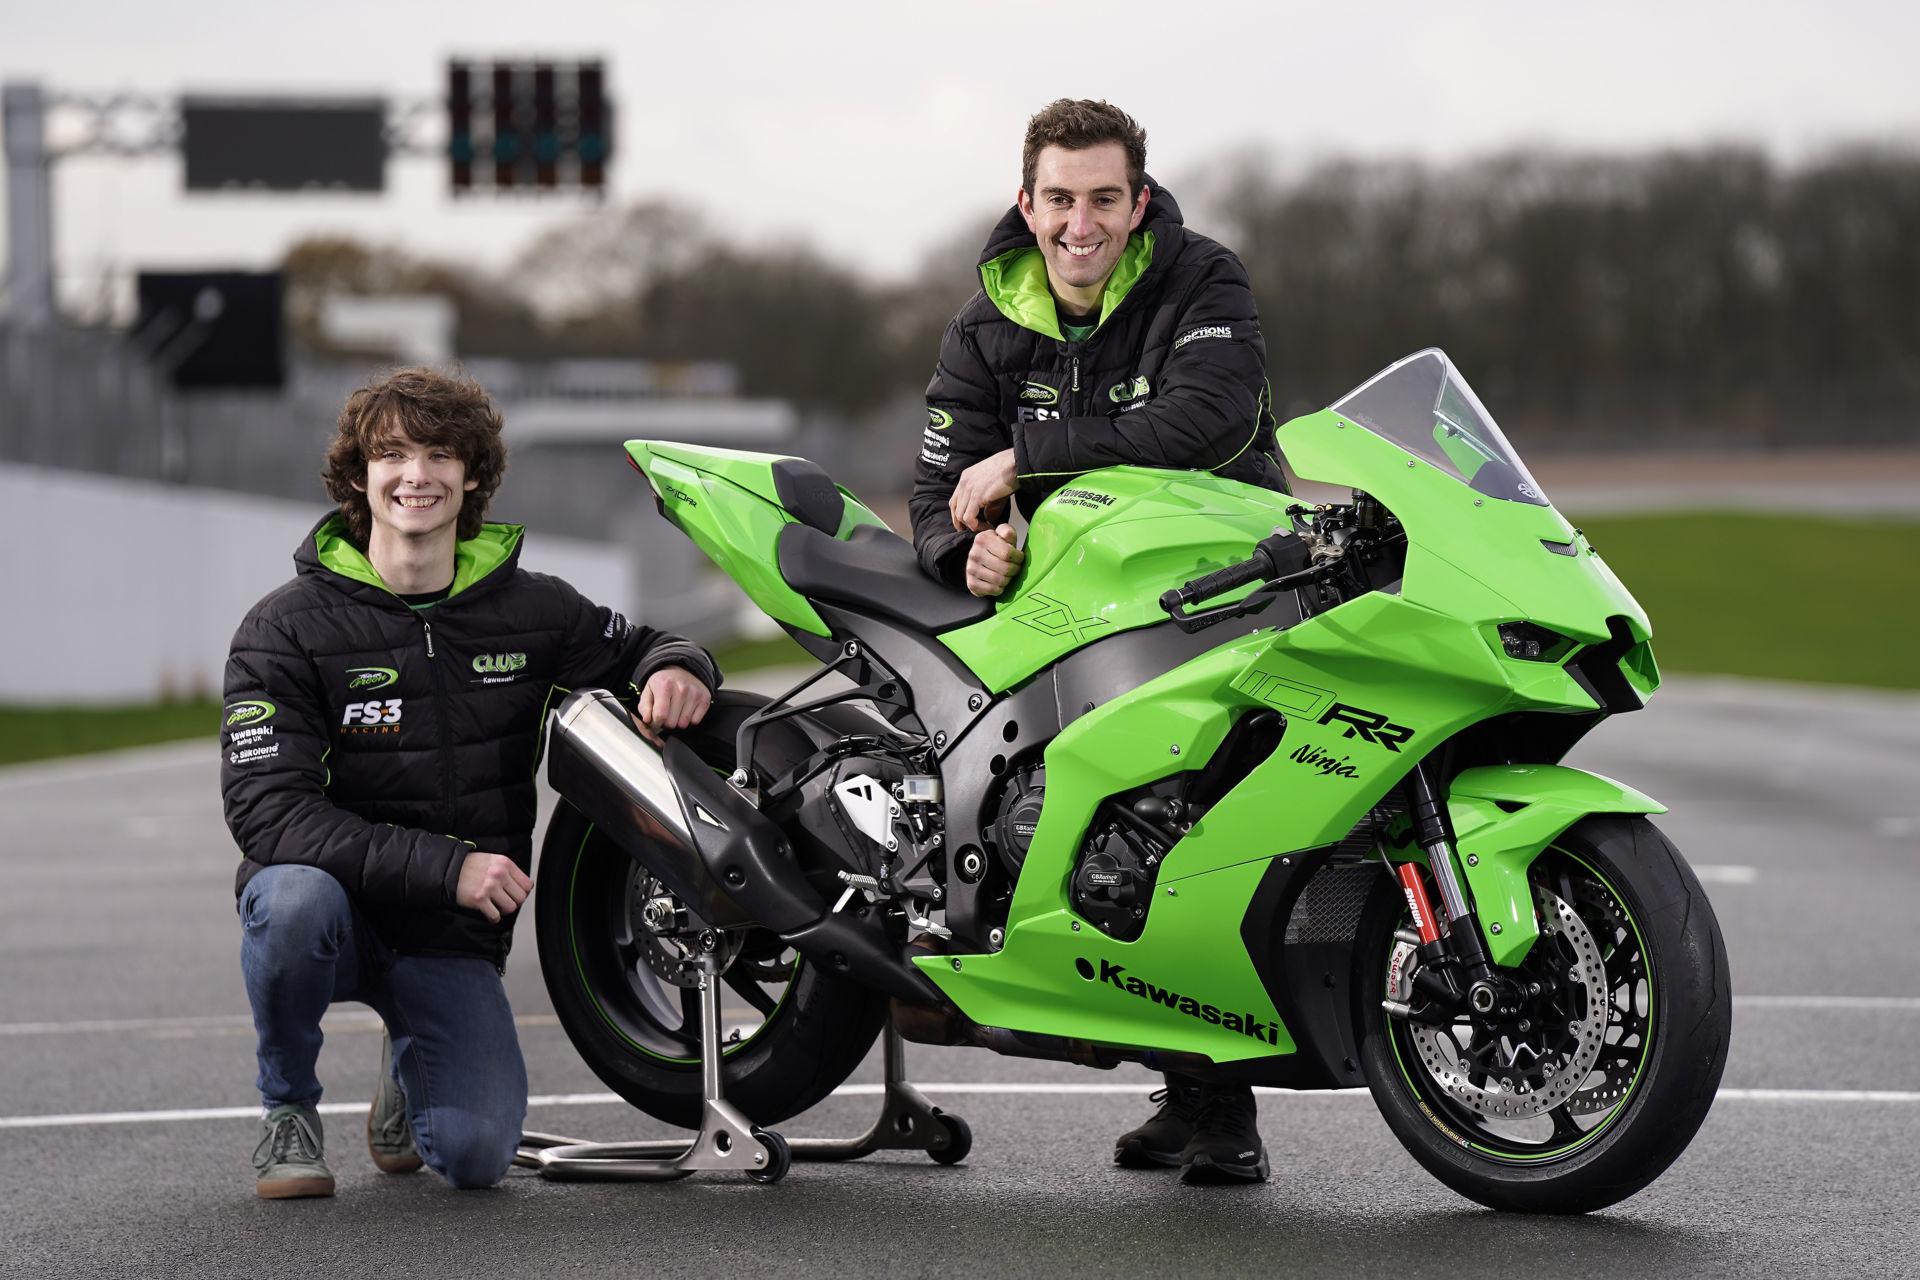 Rory Skinner (left) and Lee Jackson (right). Photo courtesy Kawasaki Motors UK.